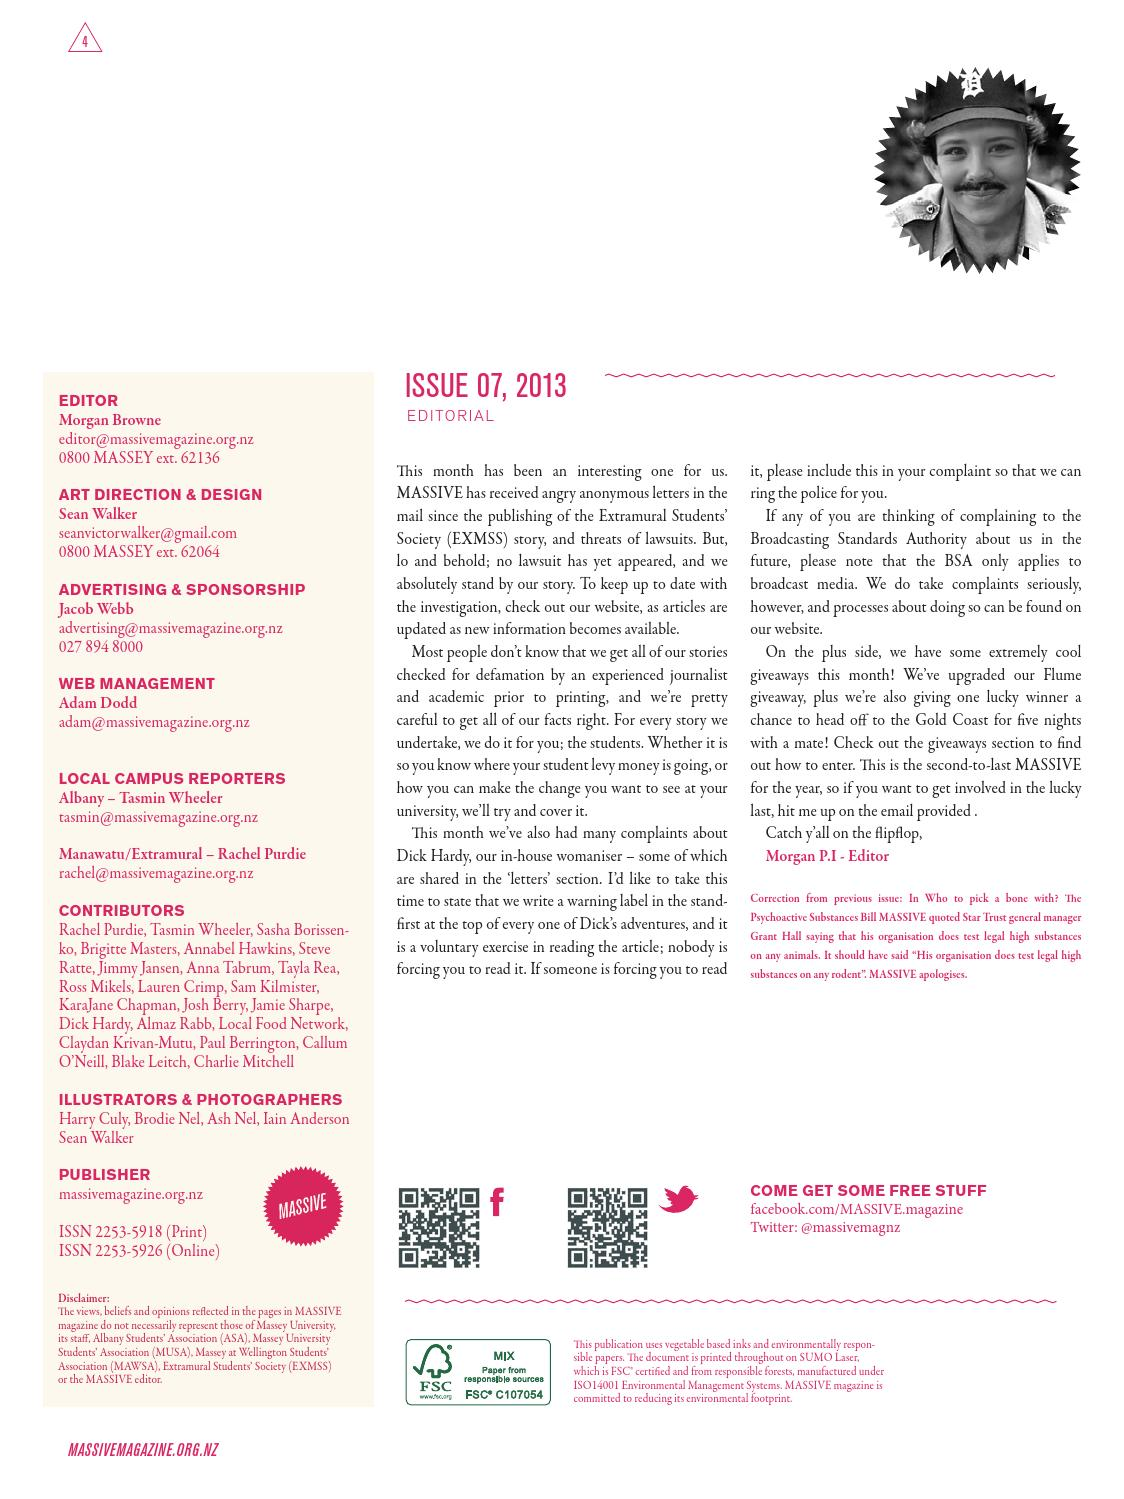 Massive Magazine Volume 02 Issue 07 by Massive Magazine - issuu